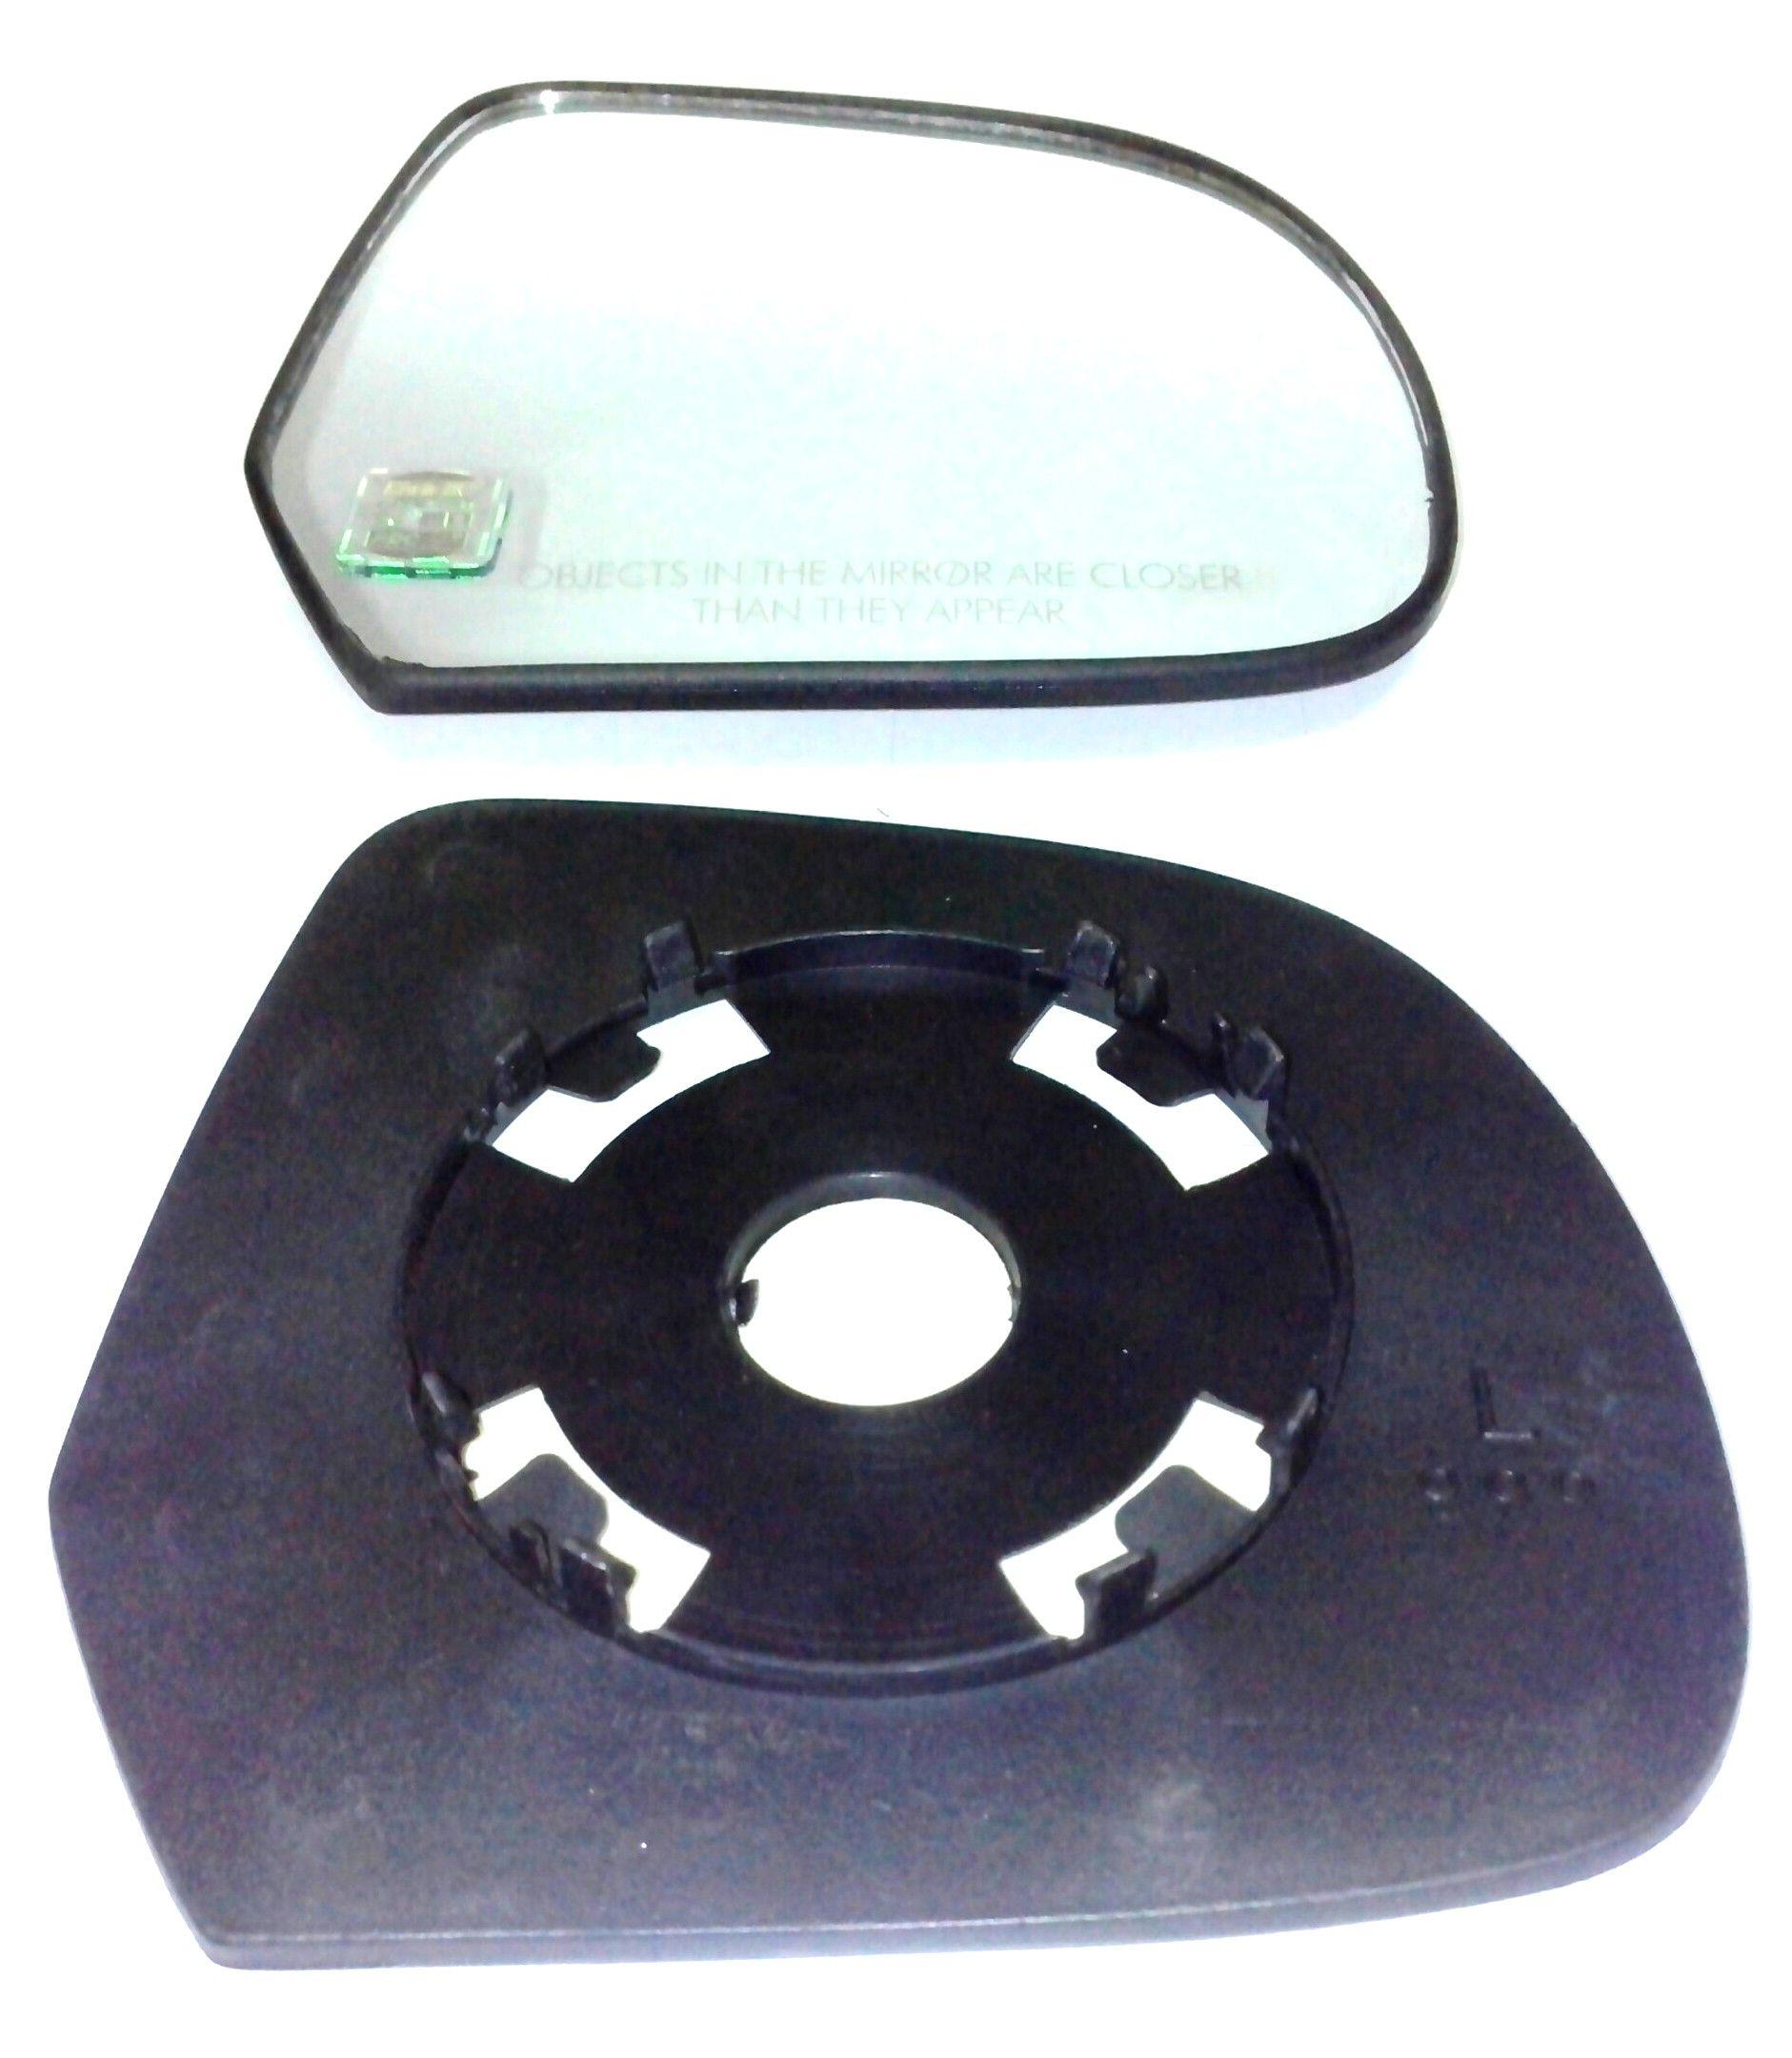 MANTRA-CONVEX MIRROR PLATES (SUB MIRROR PLATES) FOR CHEVROLET SPARK LEFT SIDE